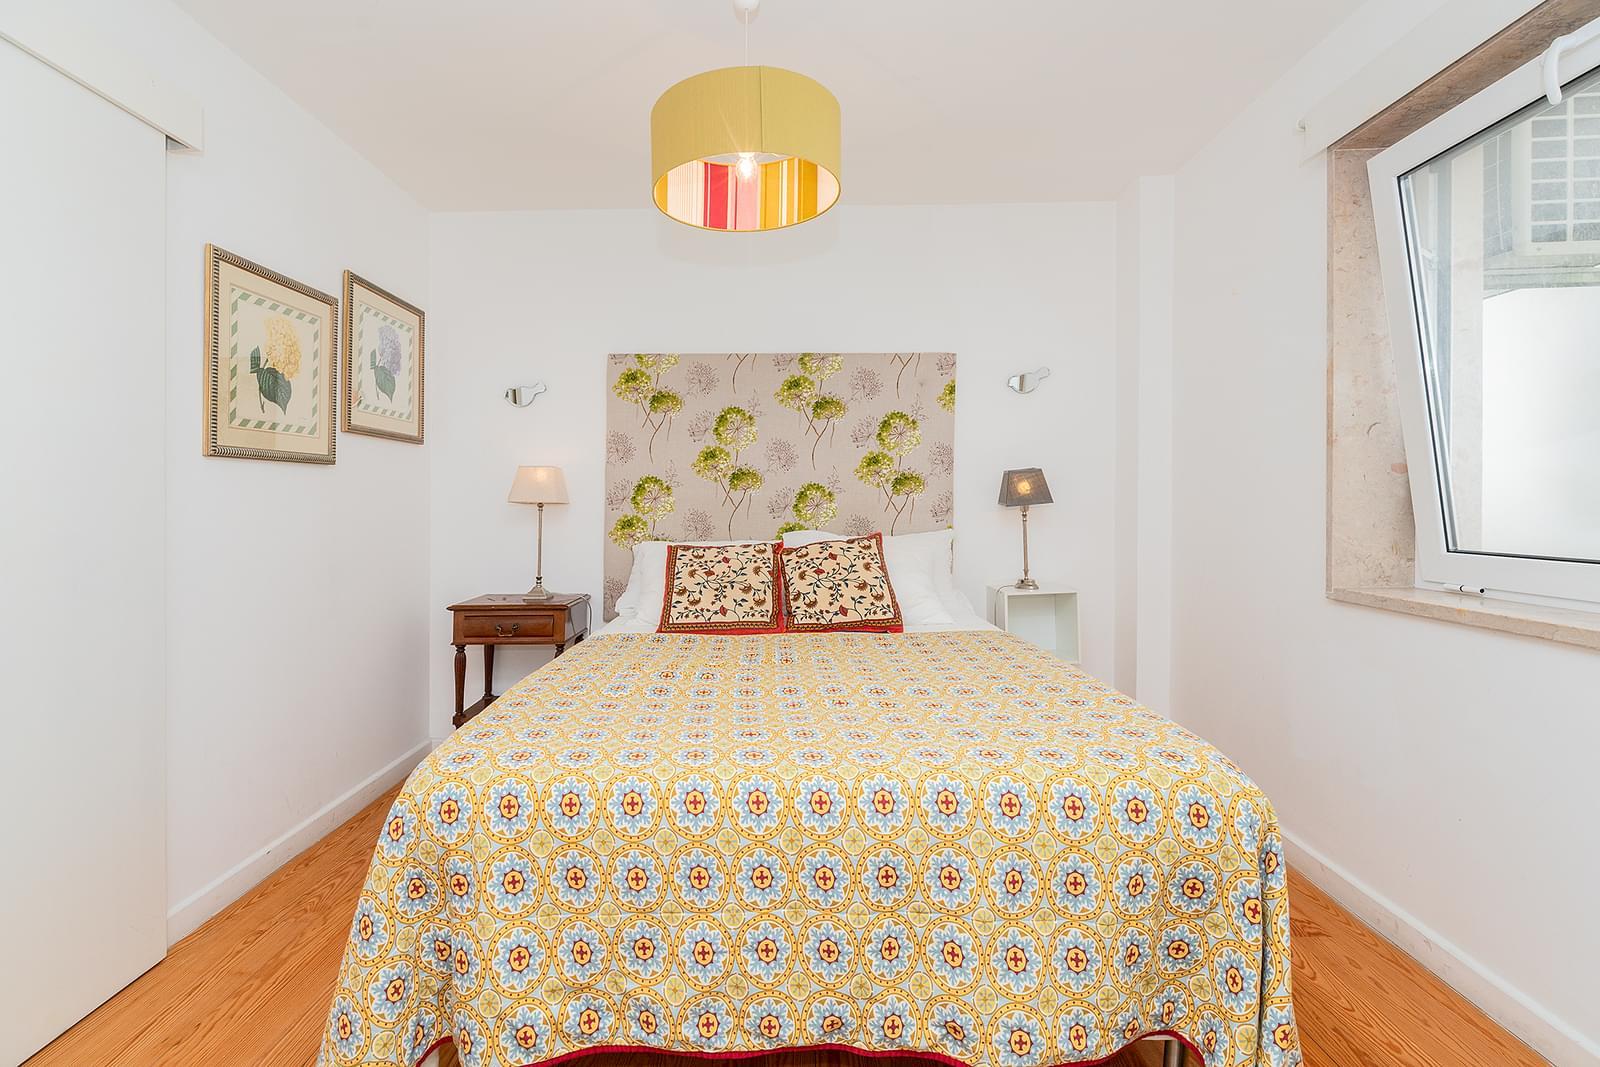 pf18727-apartamento-t1-lisboa-ec7879f5-fda9-47f5-b485-eeceee4b7ba4